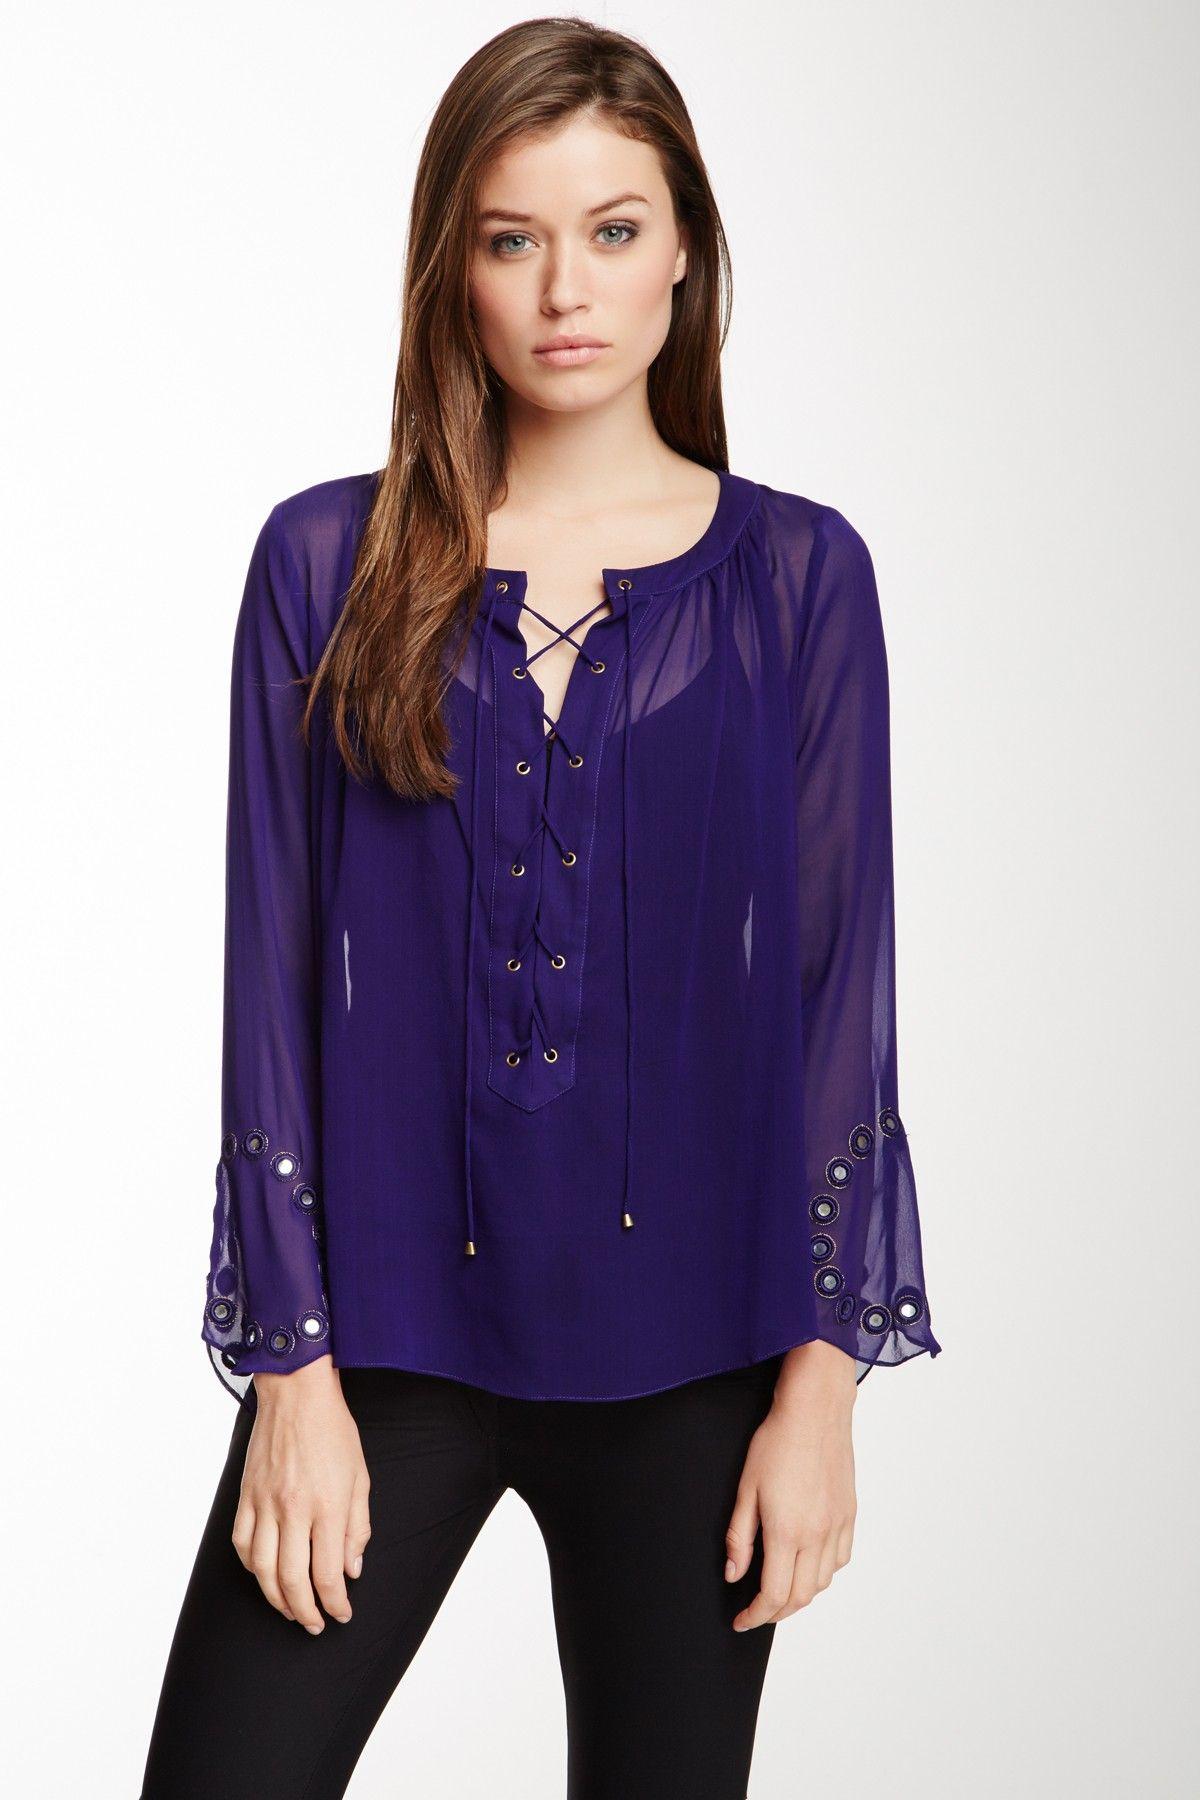 Nicole Miller silk top <3 | MI VESTUARIO | Pinterest | Moda vestidos ...